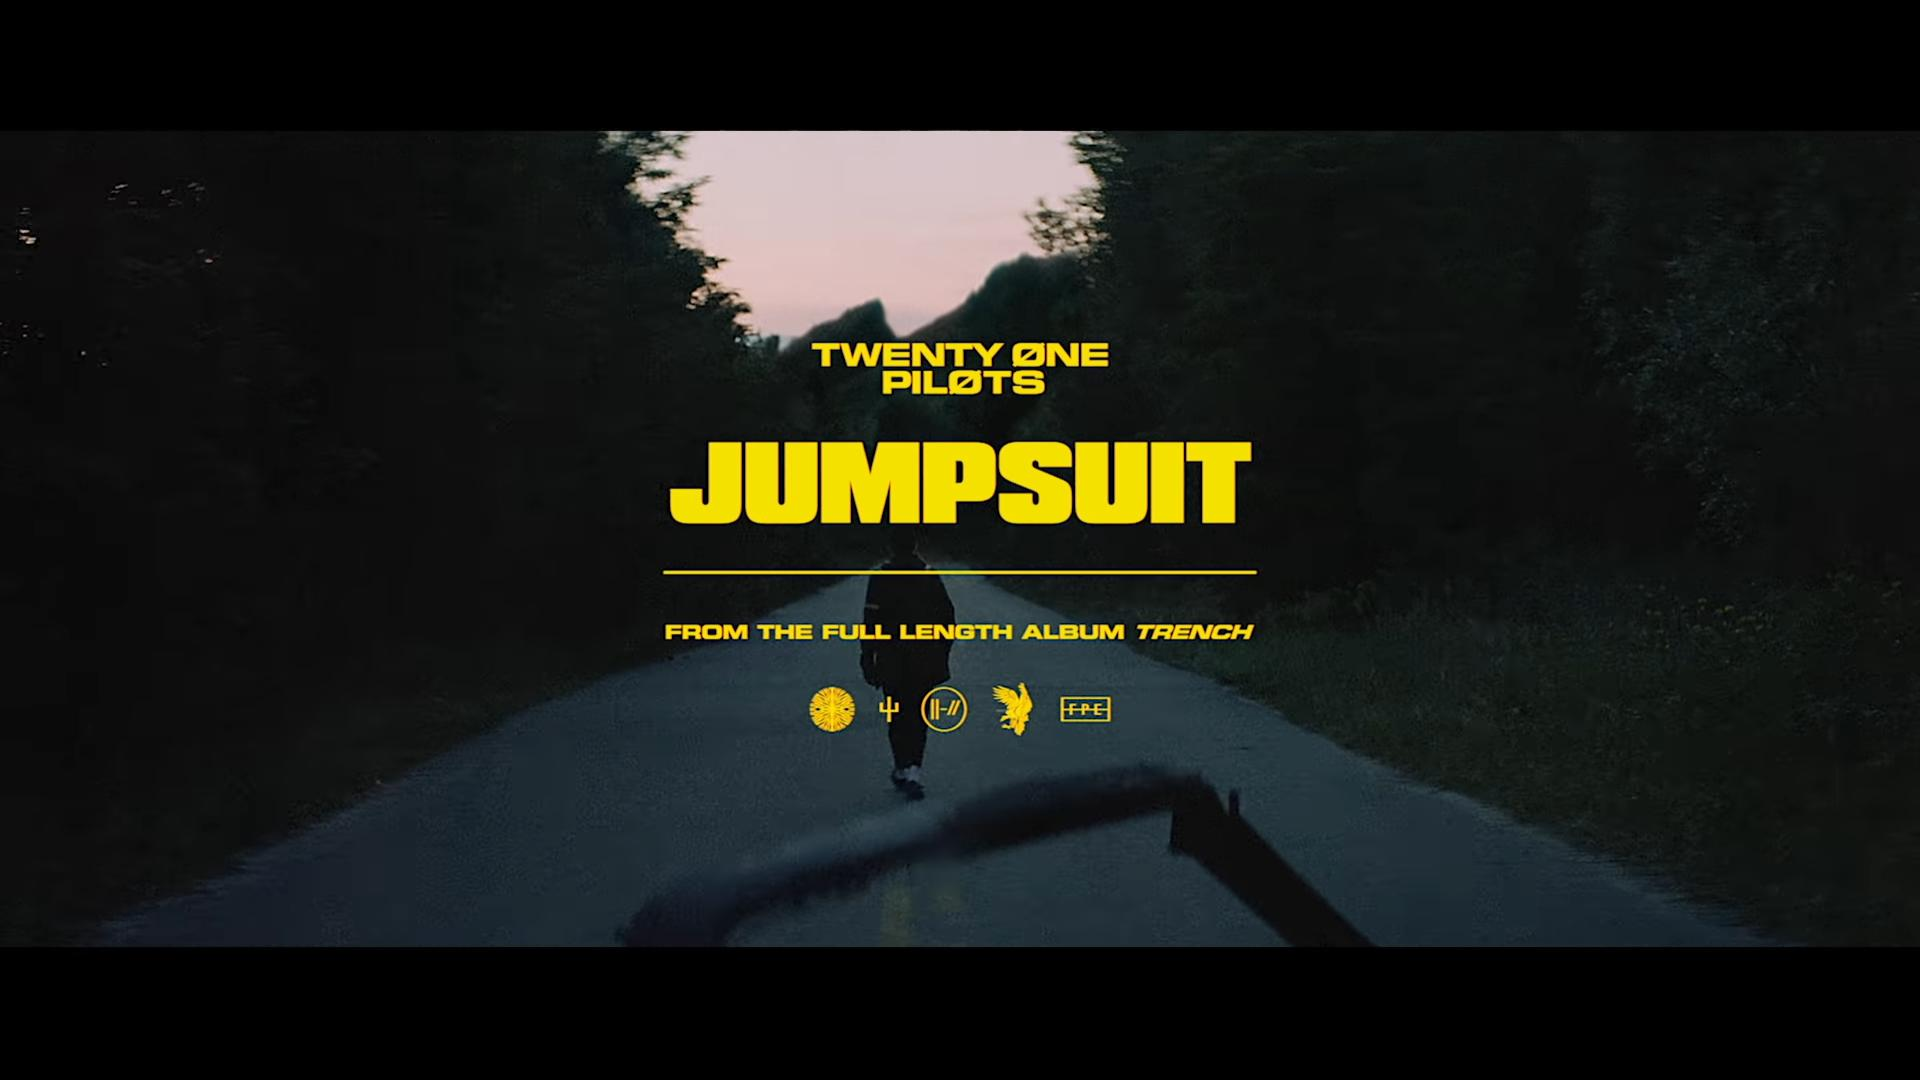 Jumpsuit Twenty One Pilots - HD Wallpaper